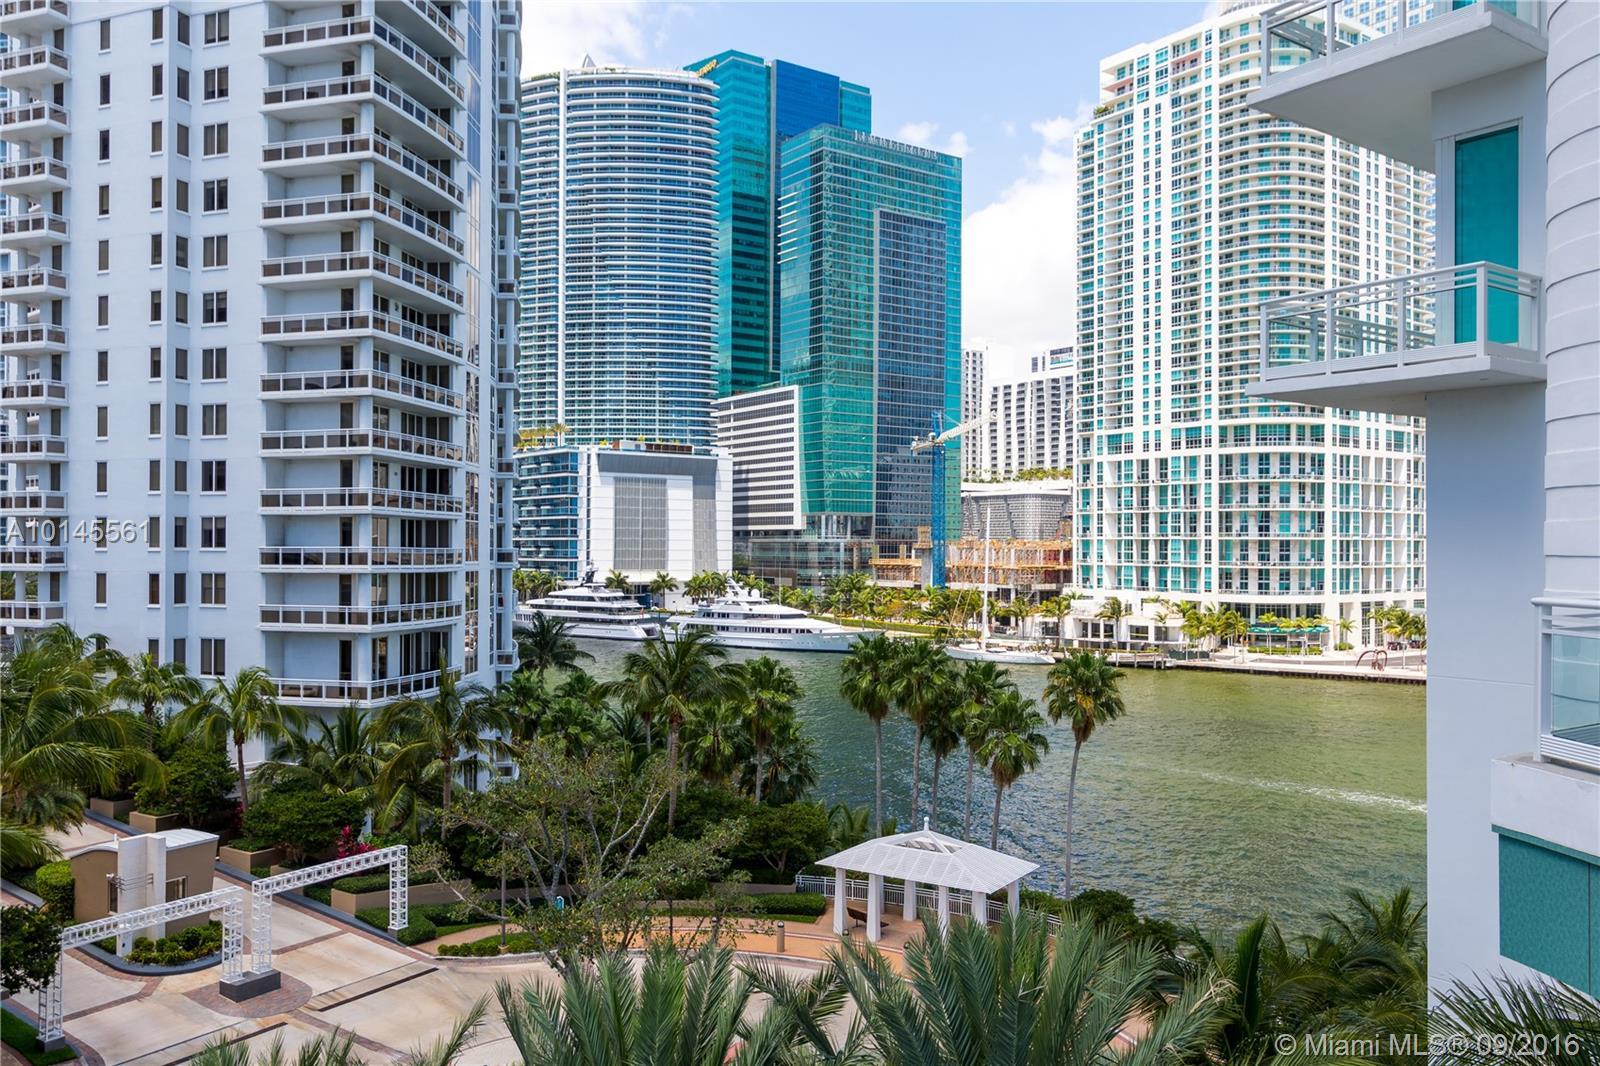 900 S Brickell Key Blvd # 3205, Miami, FL 33131